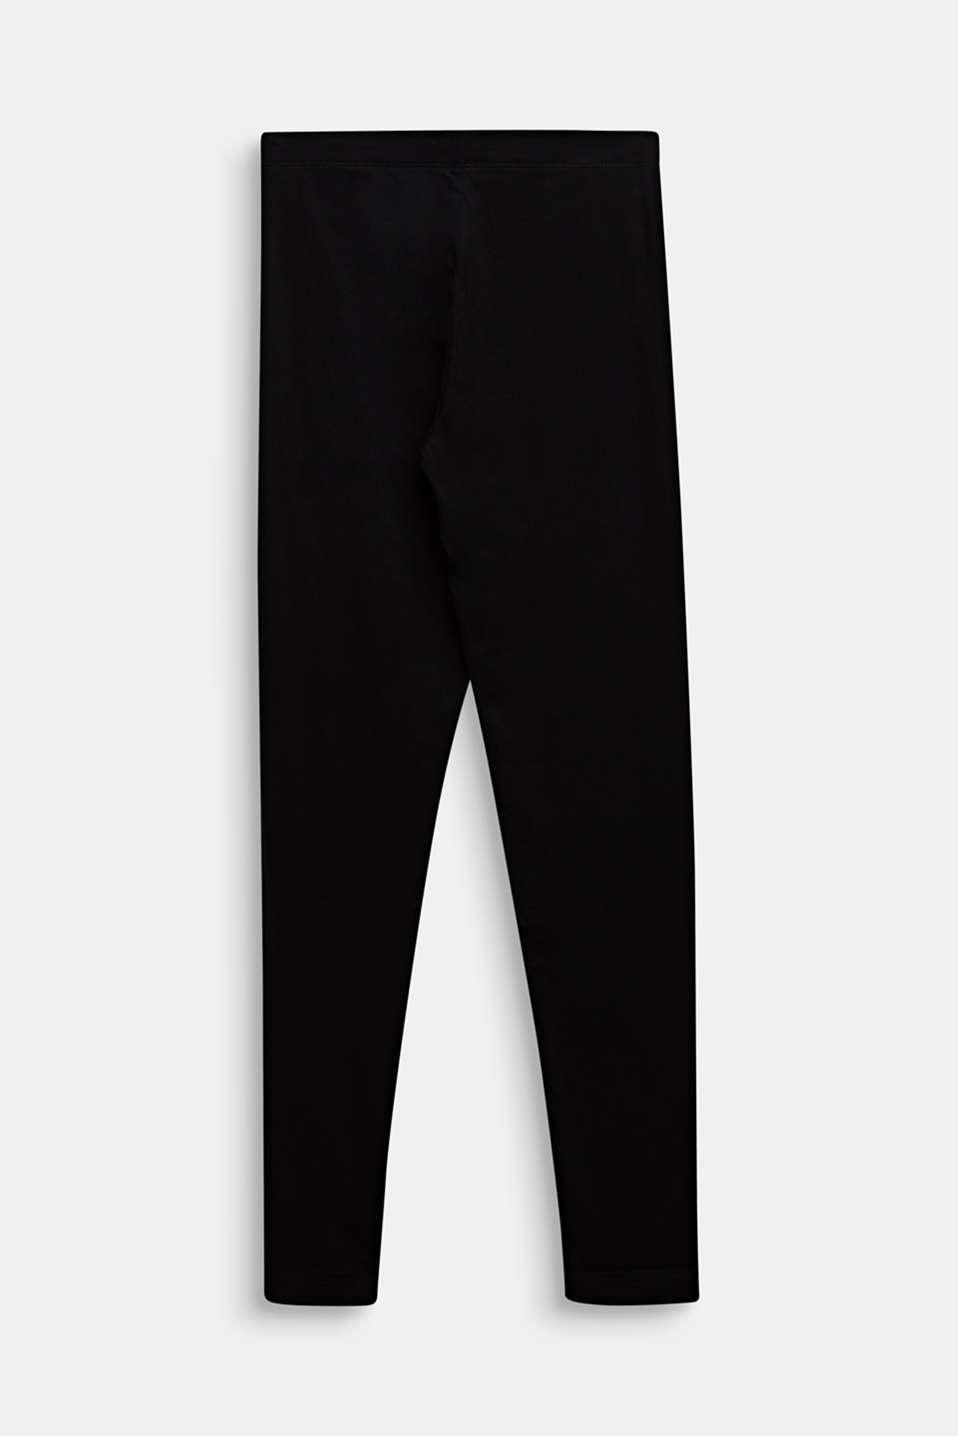 Opaque basic leggings, LCBLACK, detail image number 1